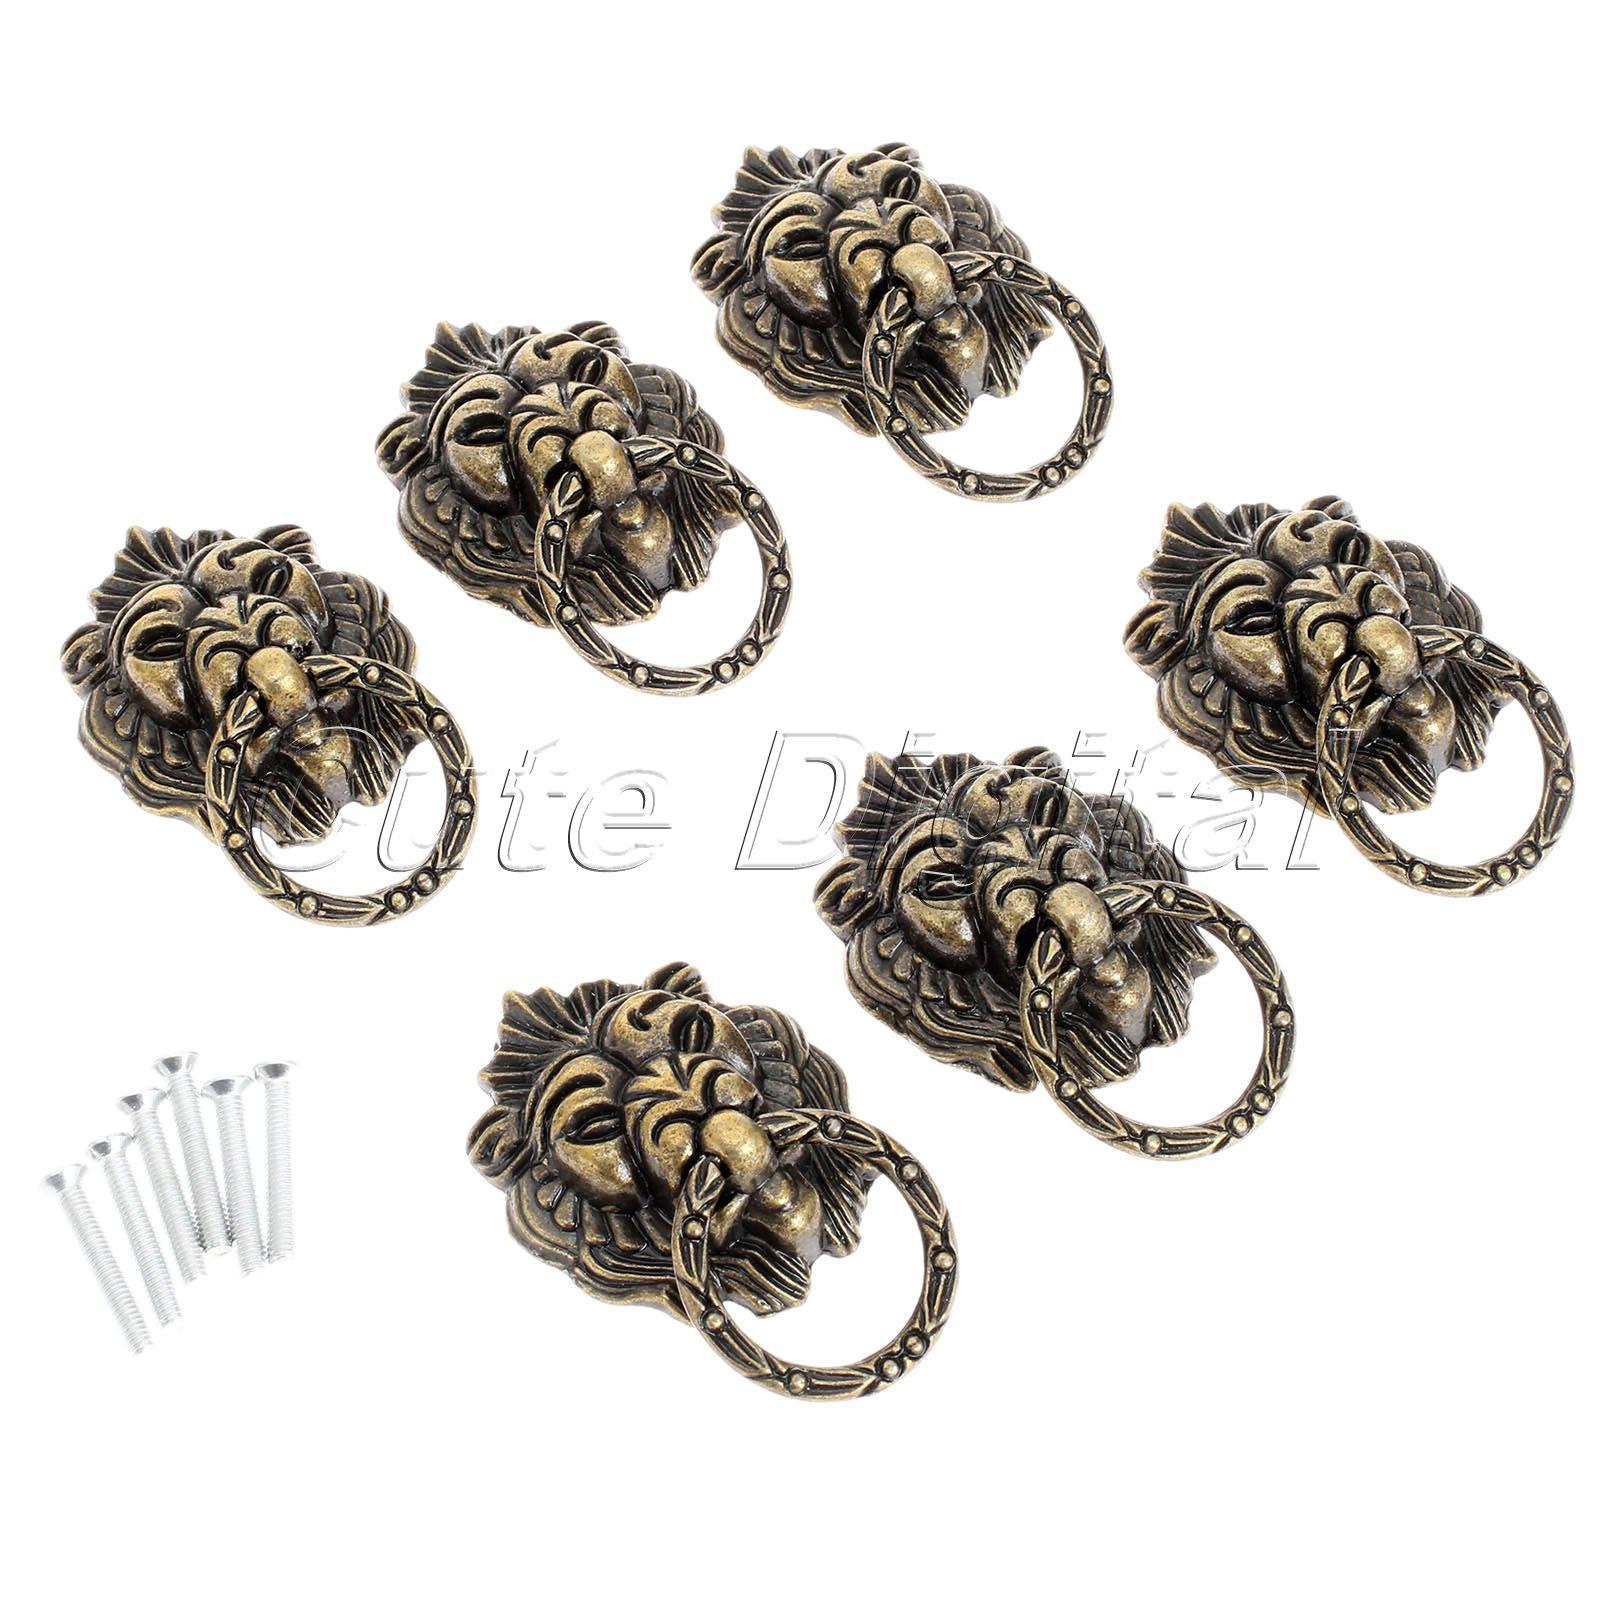 6pcs bronze chinese door handle wardrobe handle kitchen knobs cabinet hardware vintage handles decorative knob asas - Decorative Cabinet Knobs